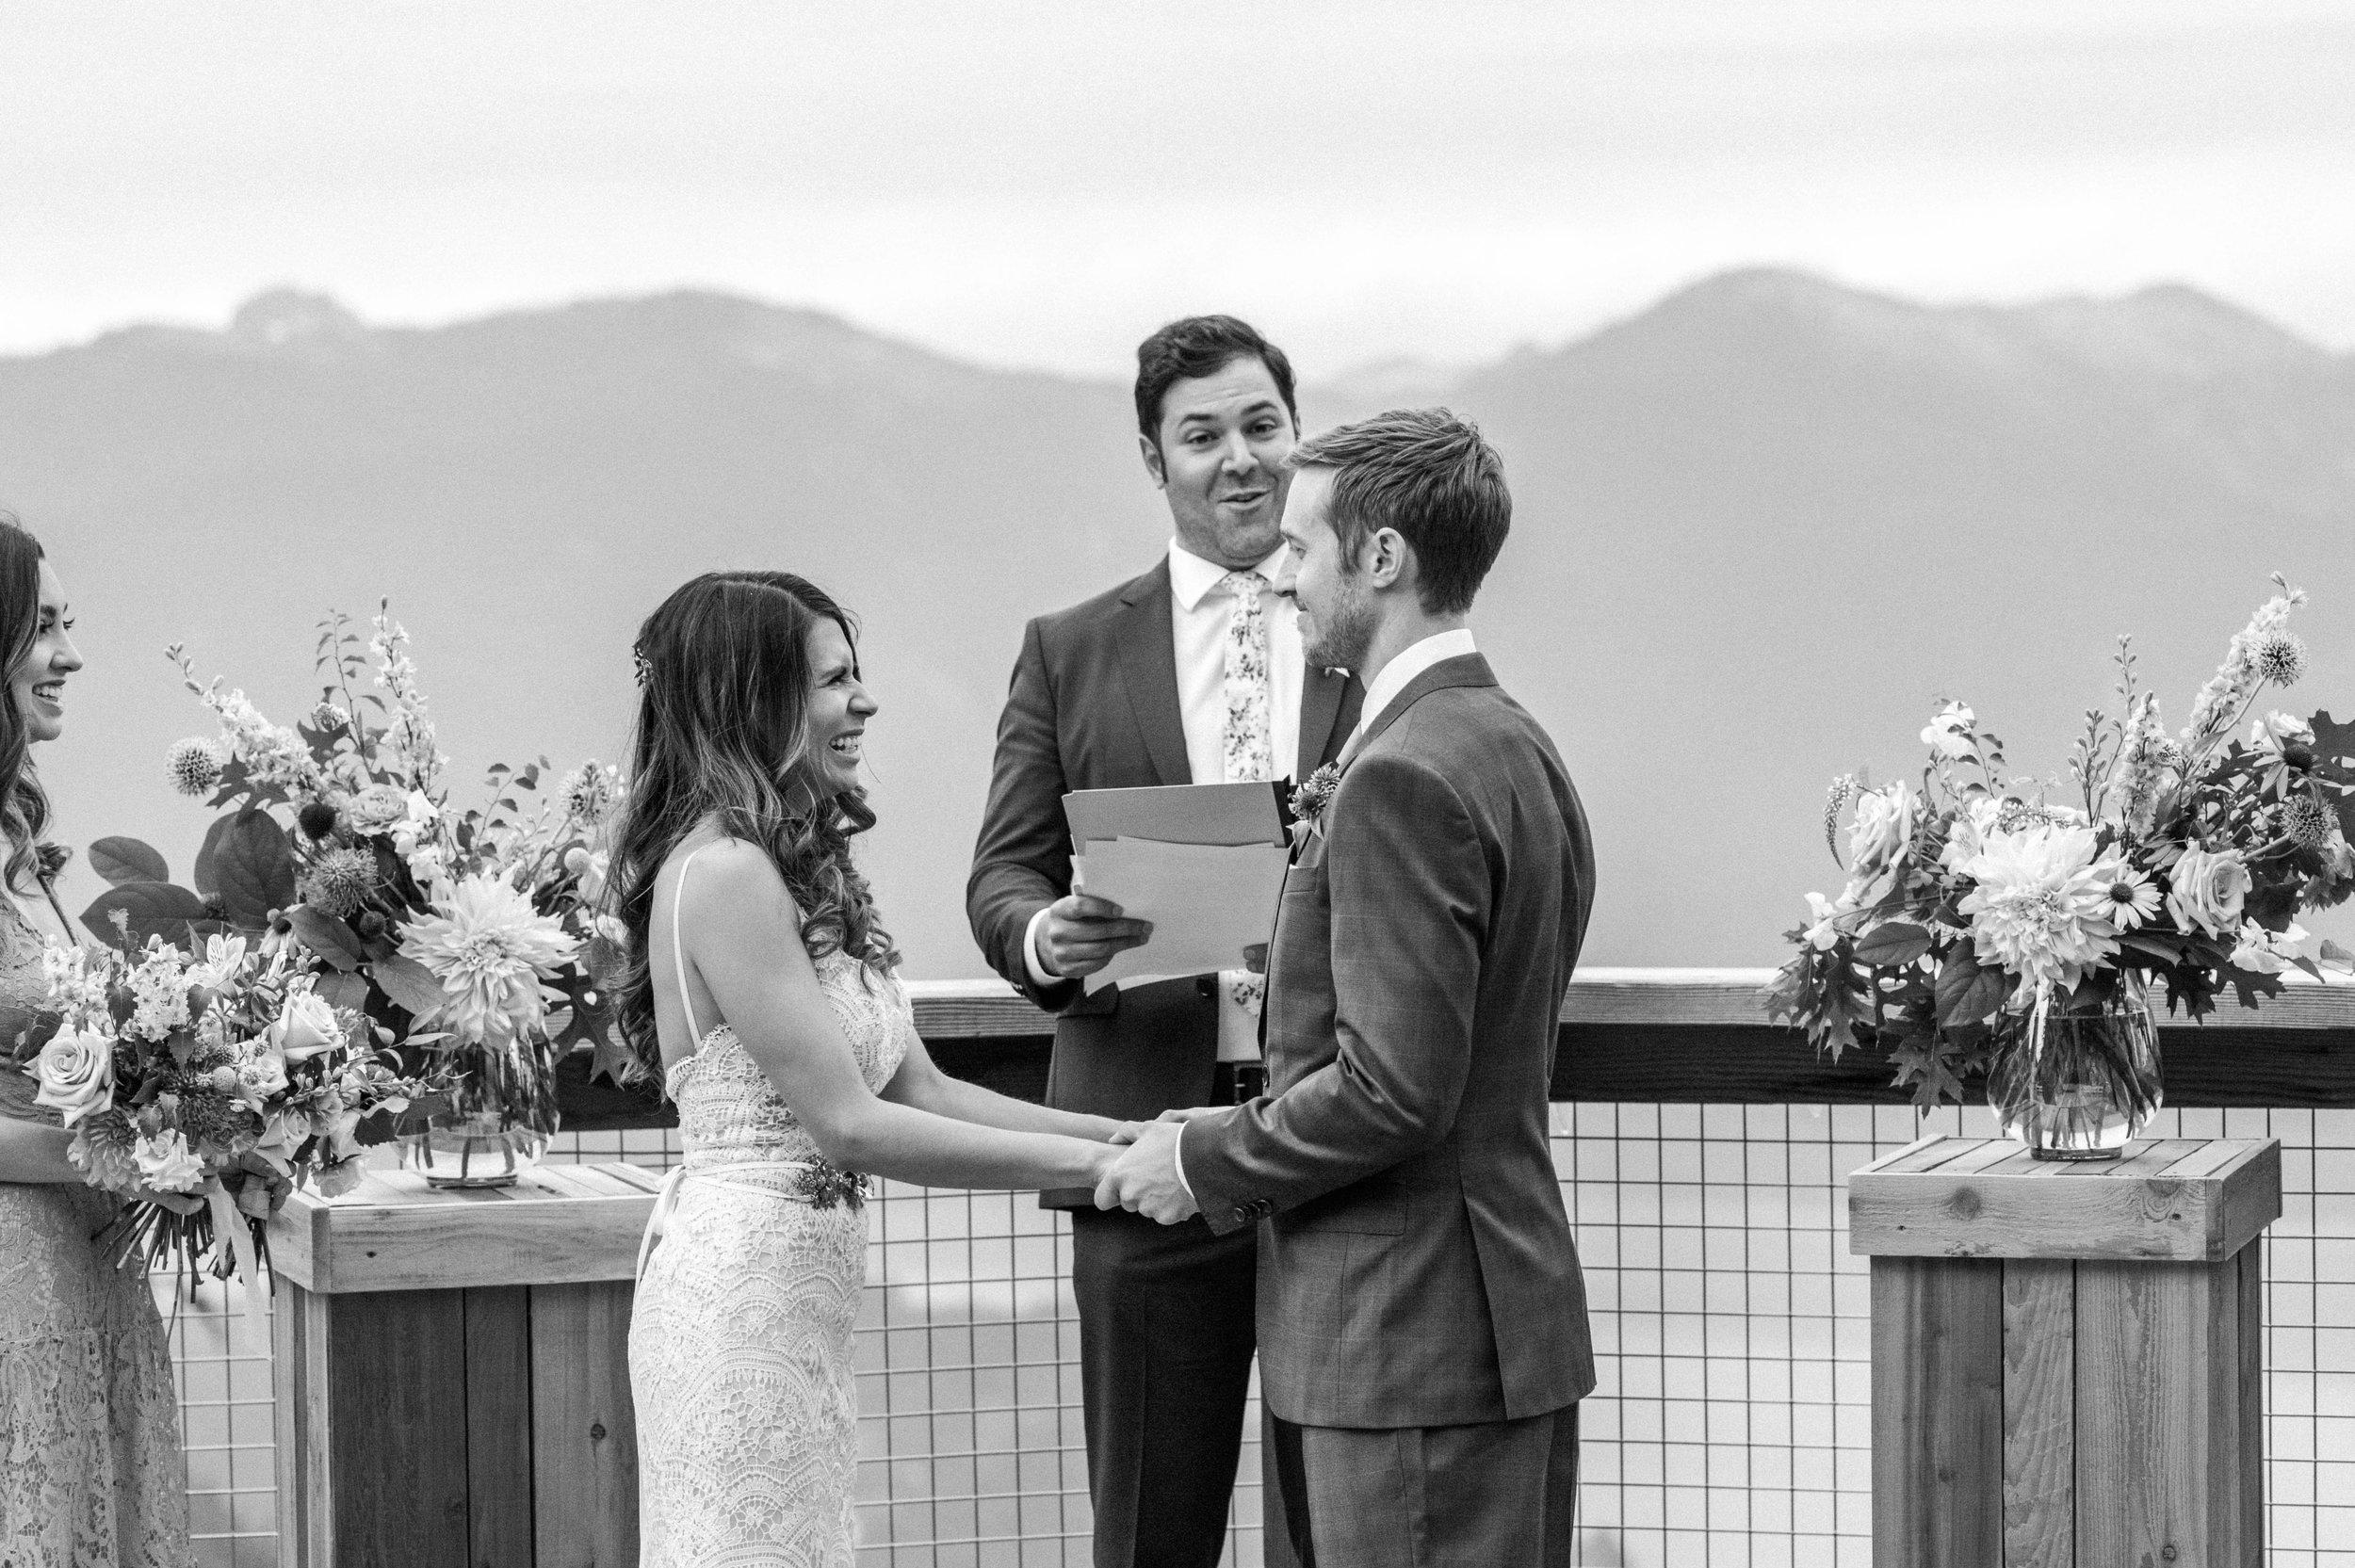 austin-texas-wedding-photography-1778-photographie-88.jpg